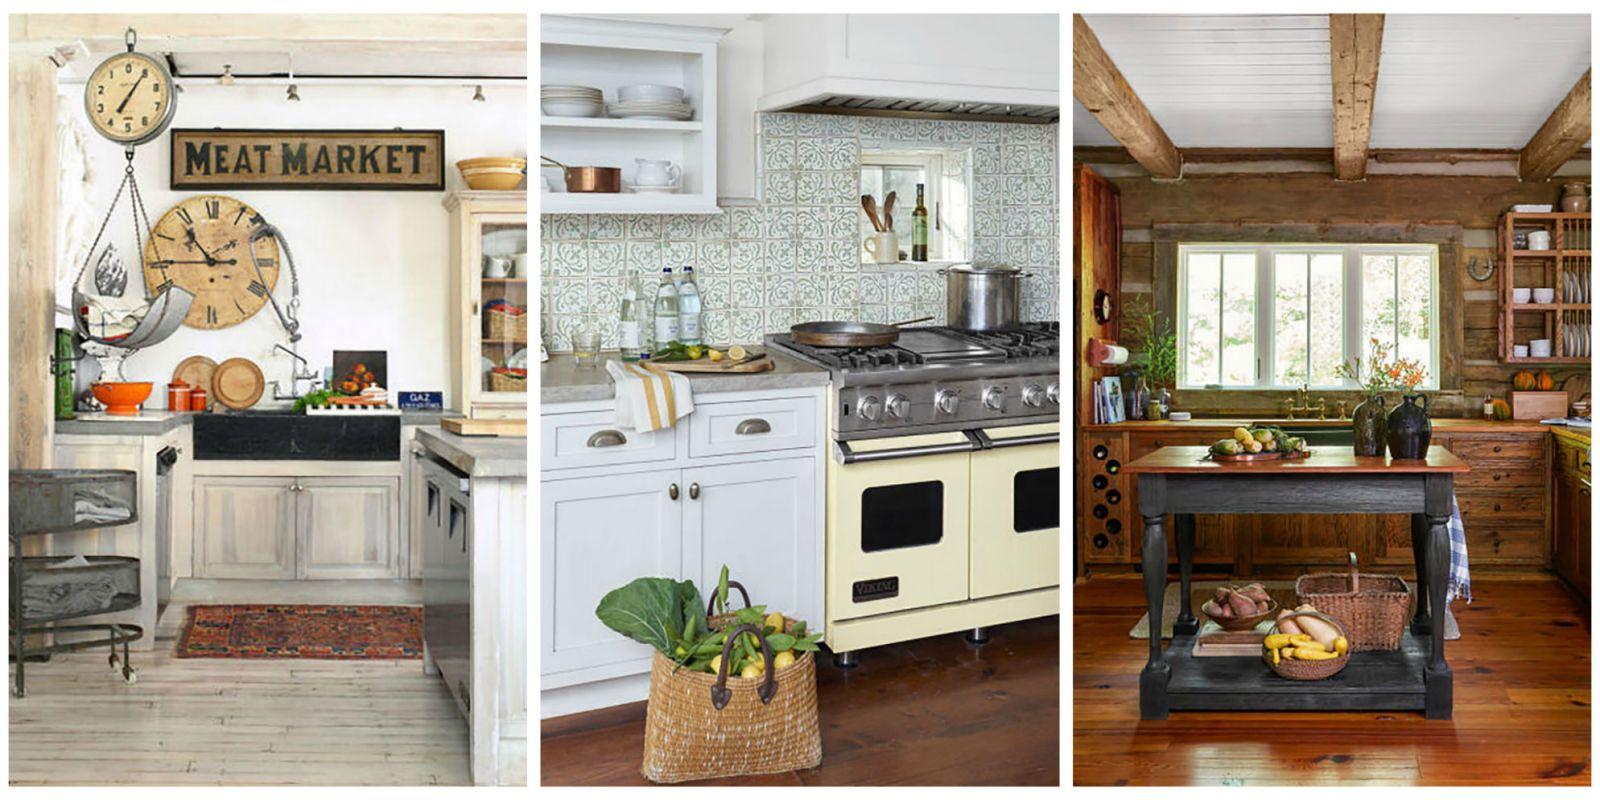 18 Farmhouse Style Kitchens - Rustic Decor Ideas for Kitchens on Rustic Farmhouse Kitchen  id=89814